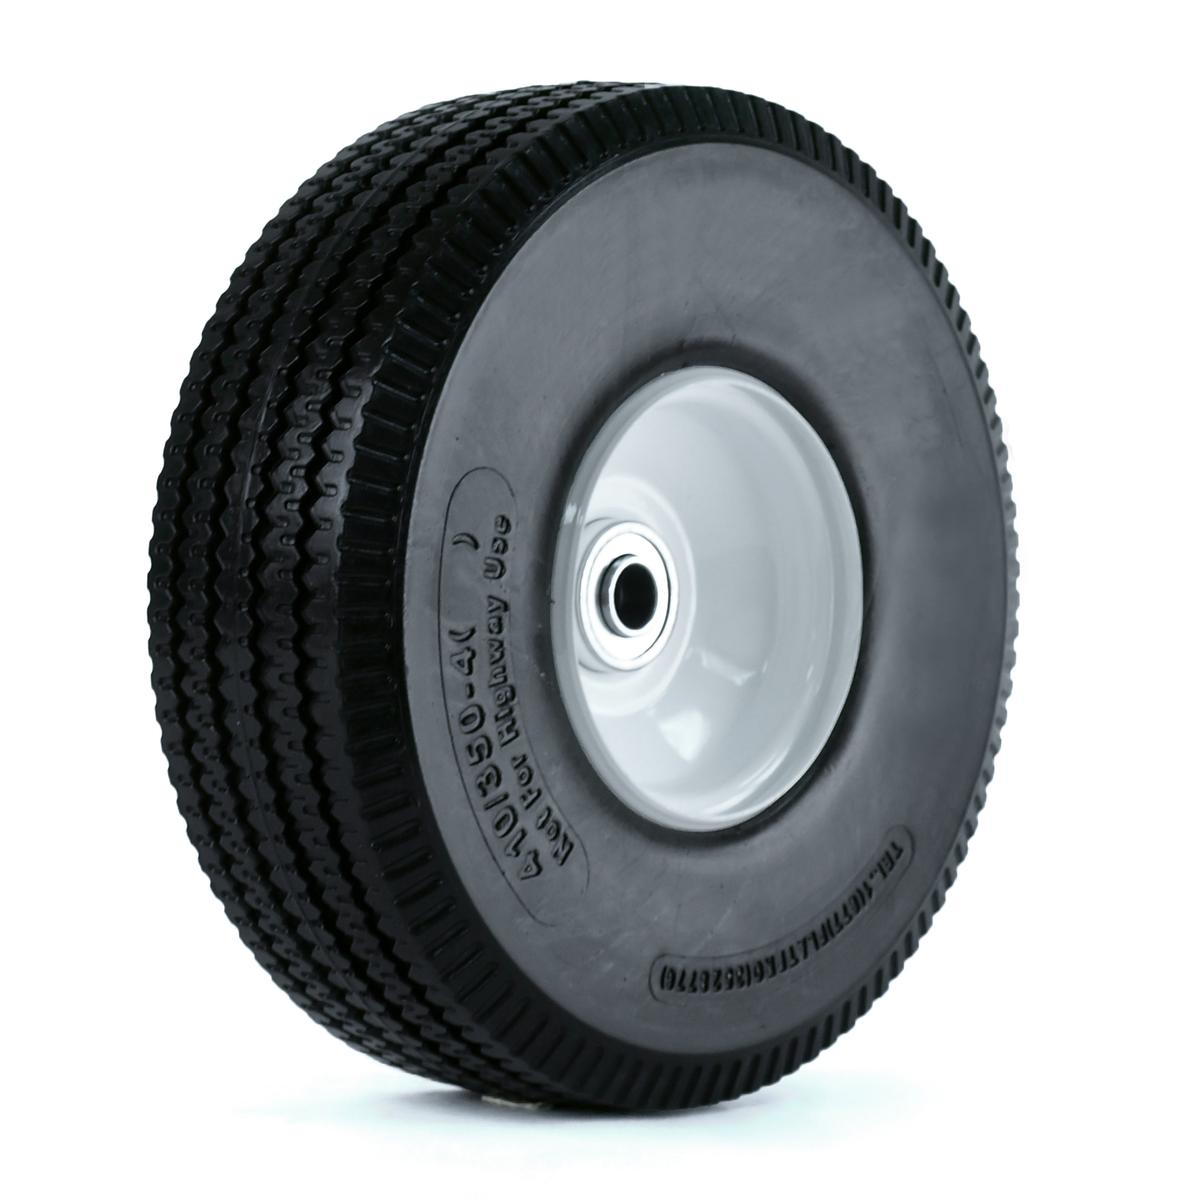 Kenda Crosshatch Tread Flat Free Solid Wheel/Tire Assemblies ($102.83 - $102.83)